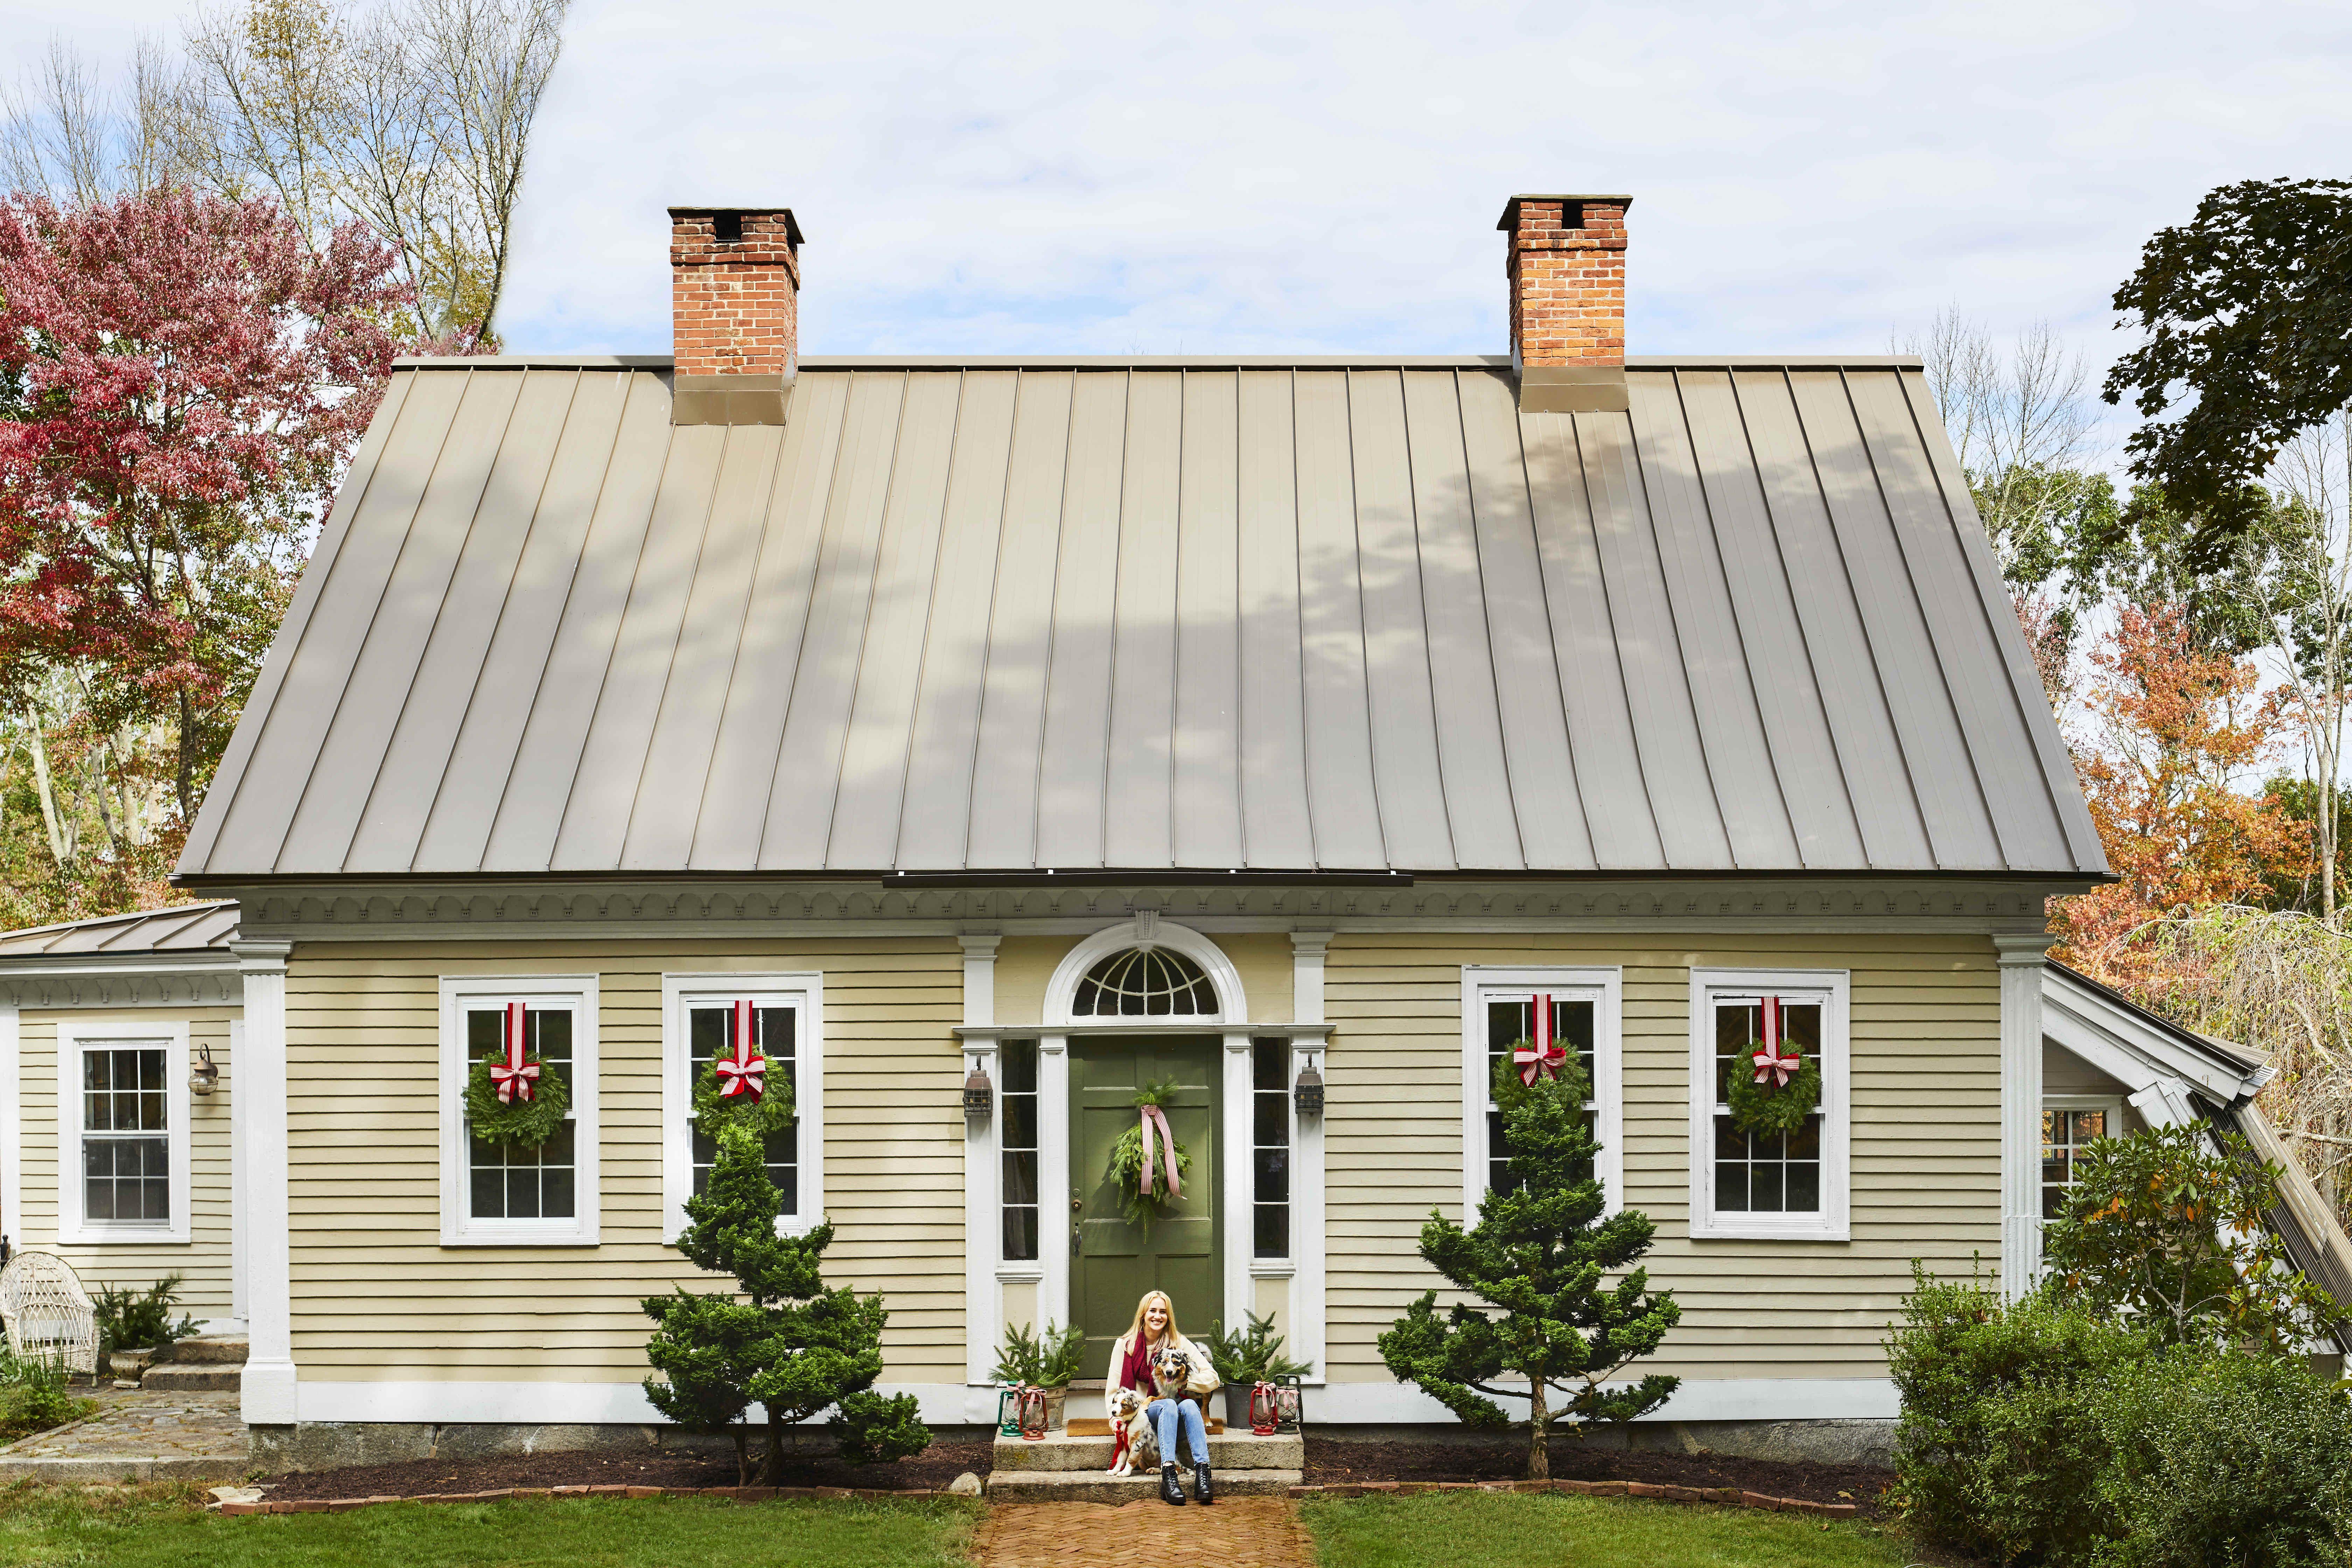 christmas porch decoration side porch cutting2 jpg 1603226587